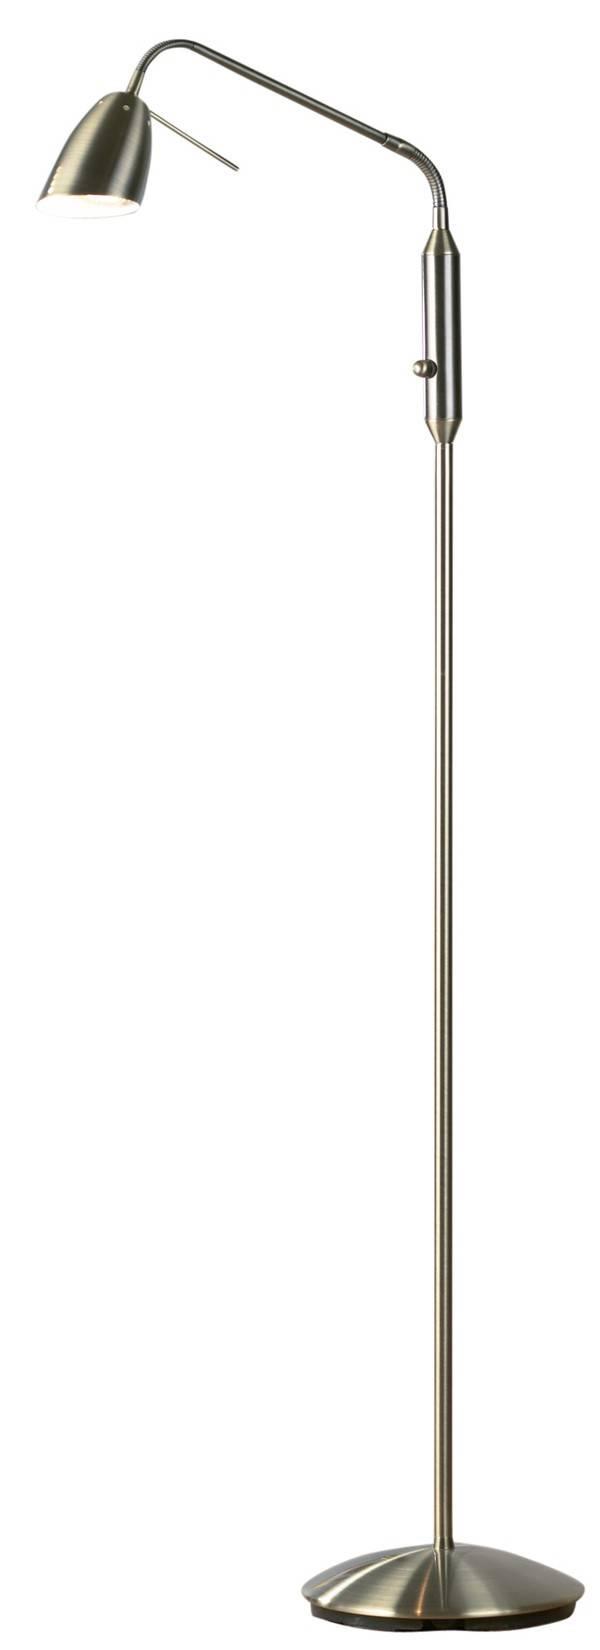 PRISBASKER!! Miami Gulvlampe serie: Miami dobbelt stander og 2 hoveder. Miami enkelt stander og 1 hoved.  Vælg imellem farverne Stål